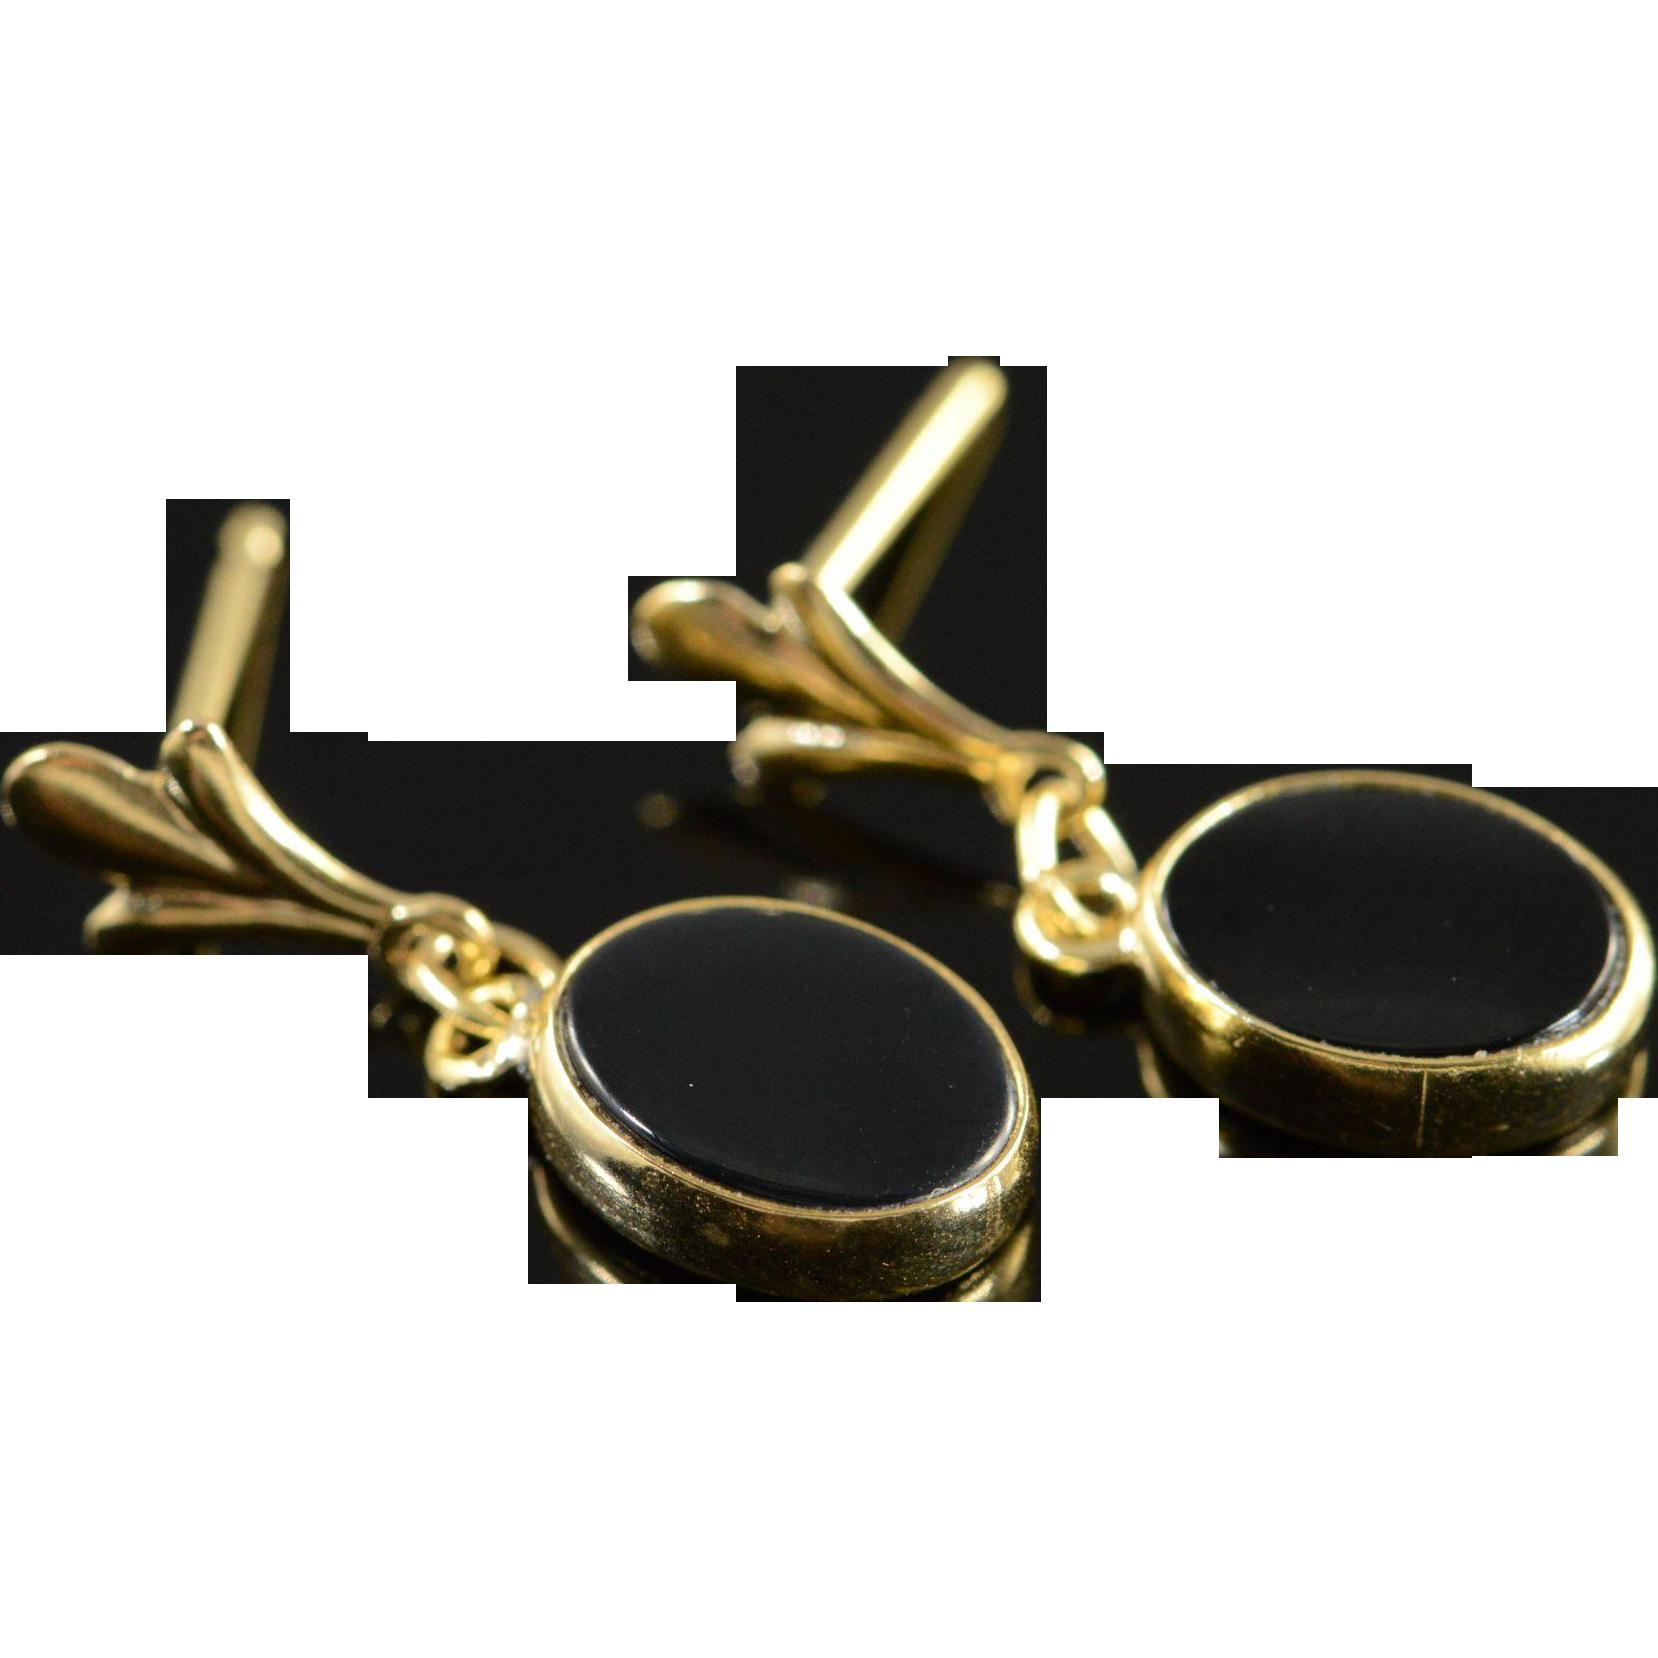 14K Simple Onyx Drop Earrings Yellow Gold from ...